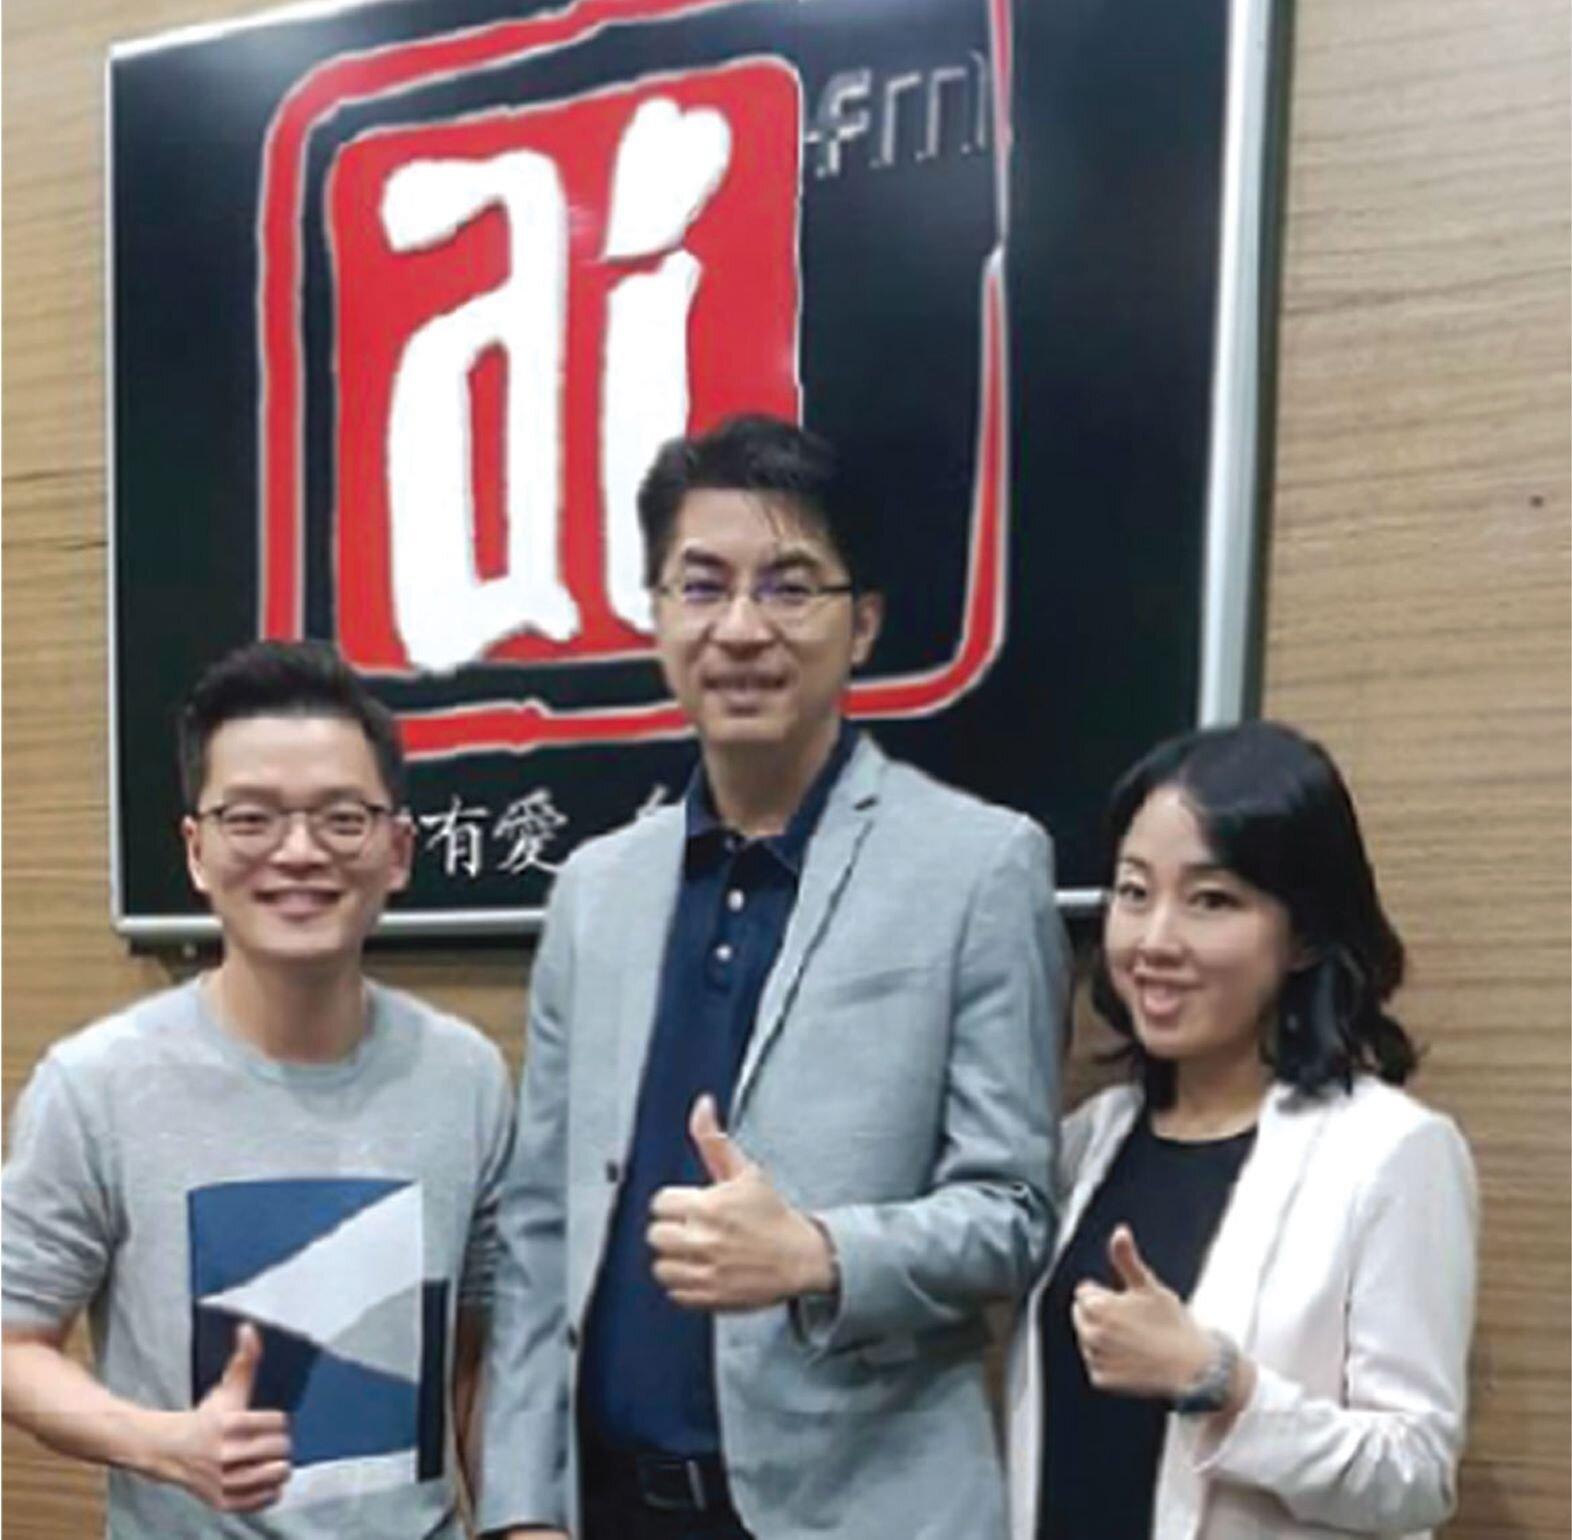 KLC首席执行长Sean Chia与营运总监——Jacelyn Tan来到爱FM(AI FM)频道104.9,与电台主持人苏进川一起分享他们9年来共同创业的心得和点滴。